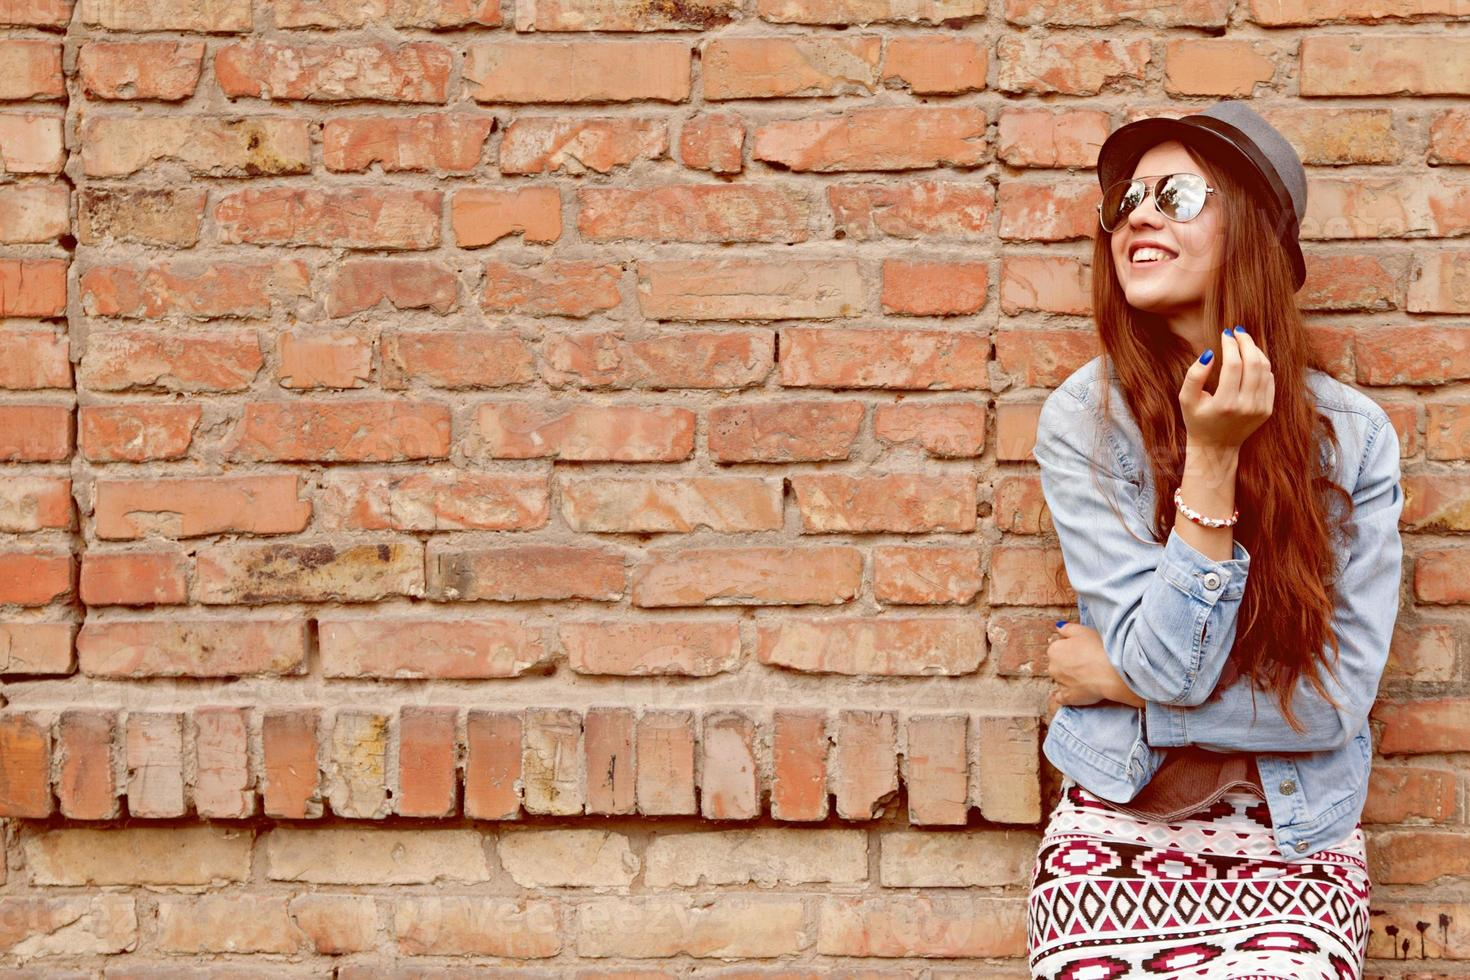 hermosa linda chica adolescente sonriendo cerca de la pared de ladrillo foto